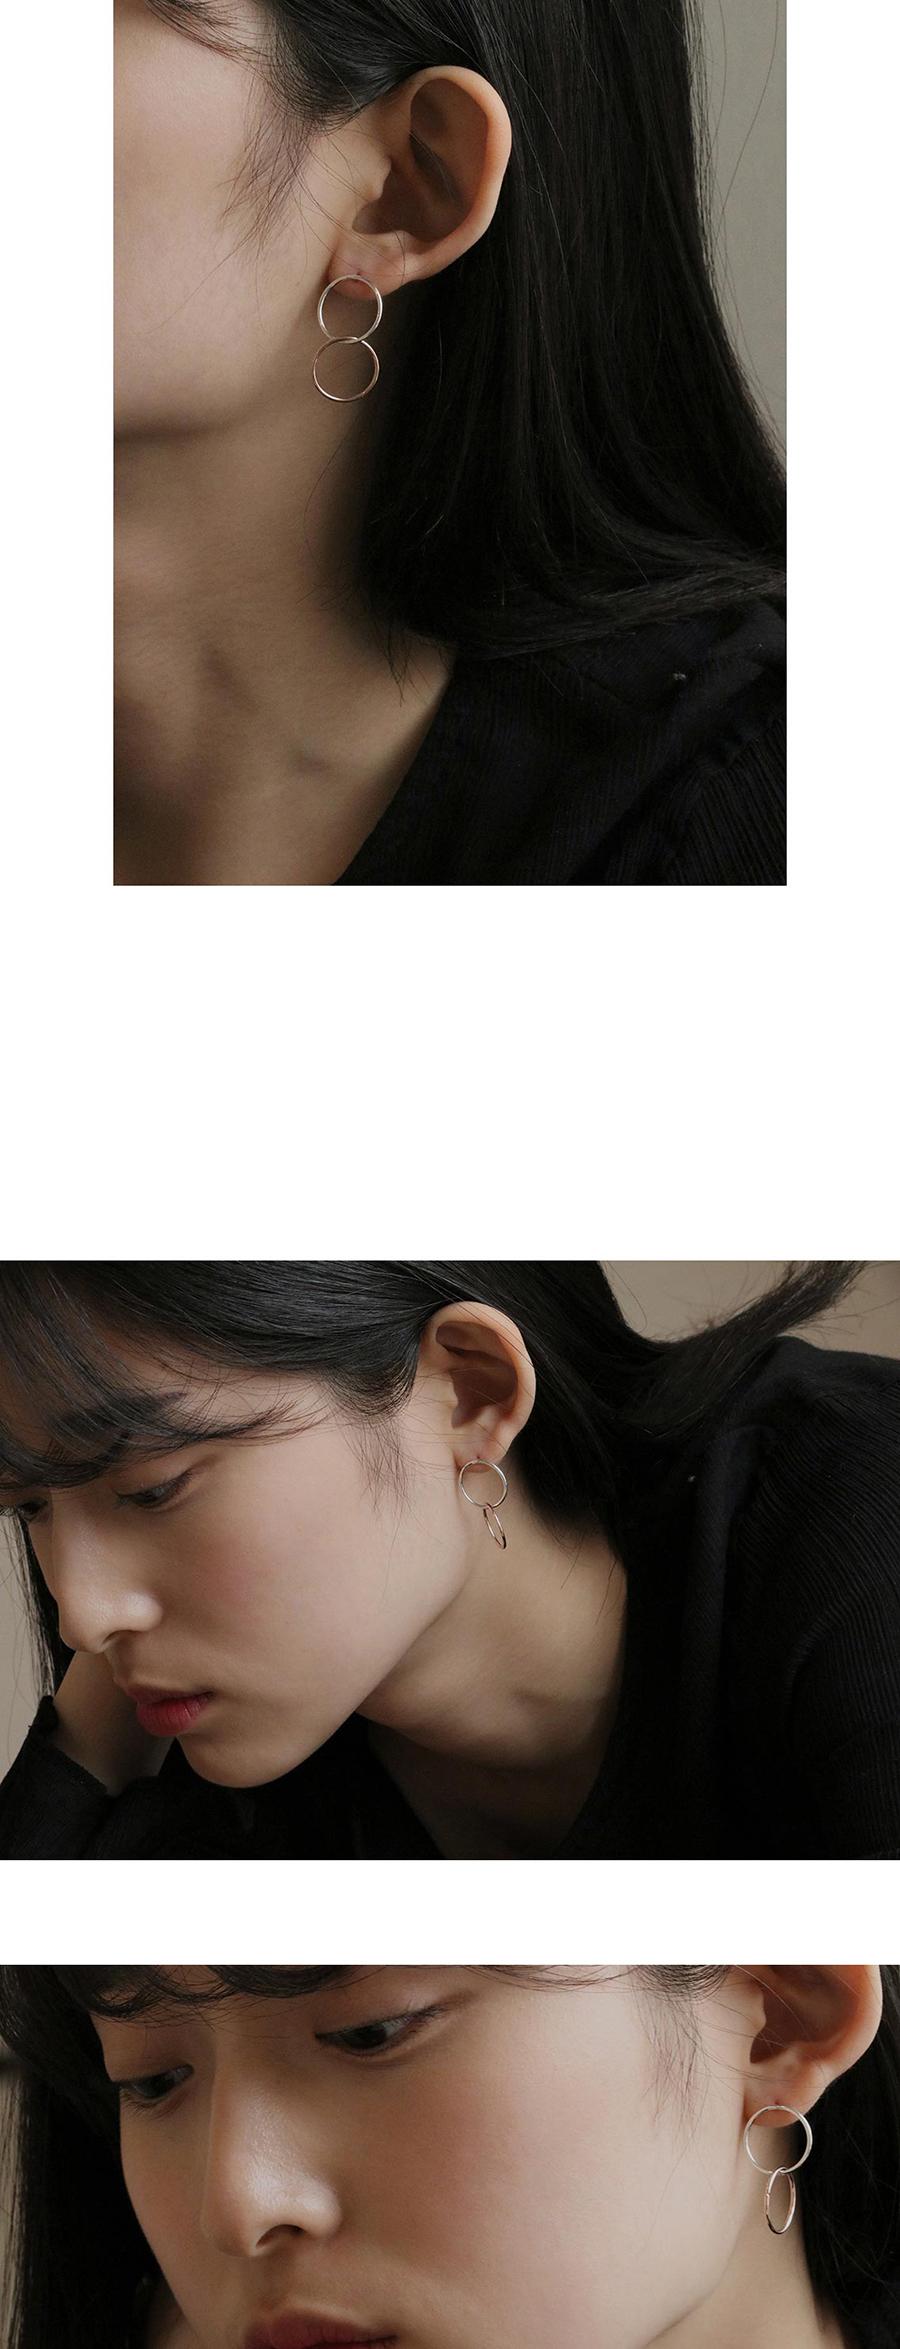 silver rose gold ring earring34,000원-레스이즈모어주얼리/시계, 귀걸이, 실버, 드롭귀걸이바보사랑silver rose gold ring earring34,000원-레스이즈모어주얼리/시계, 귀걸이, 실버, 드롭귀걸이바보사랑